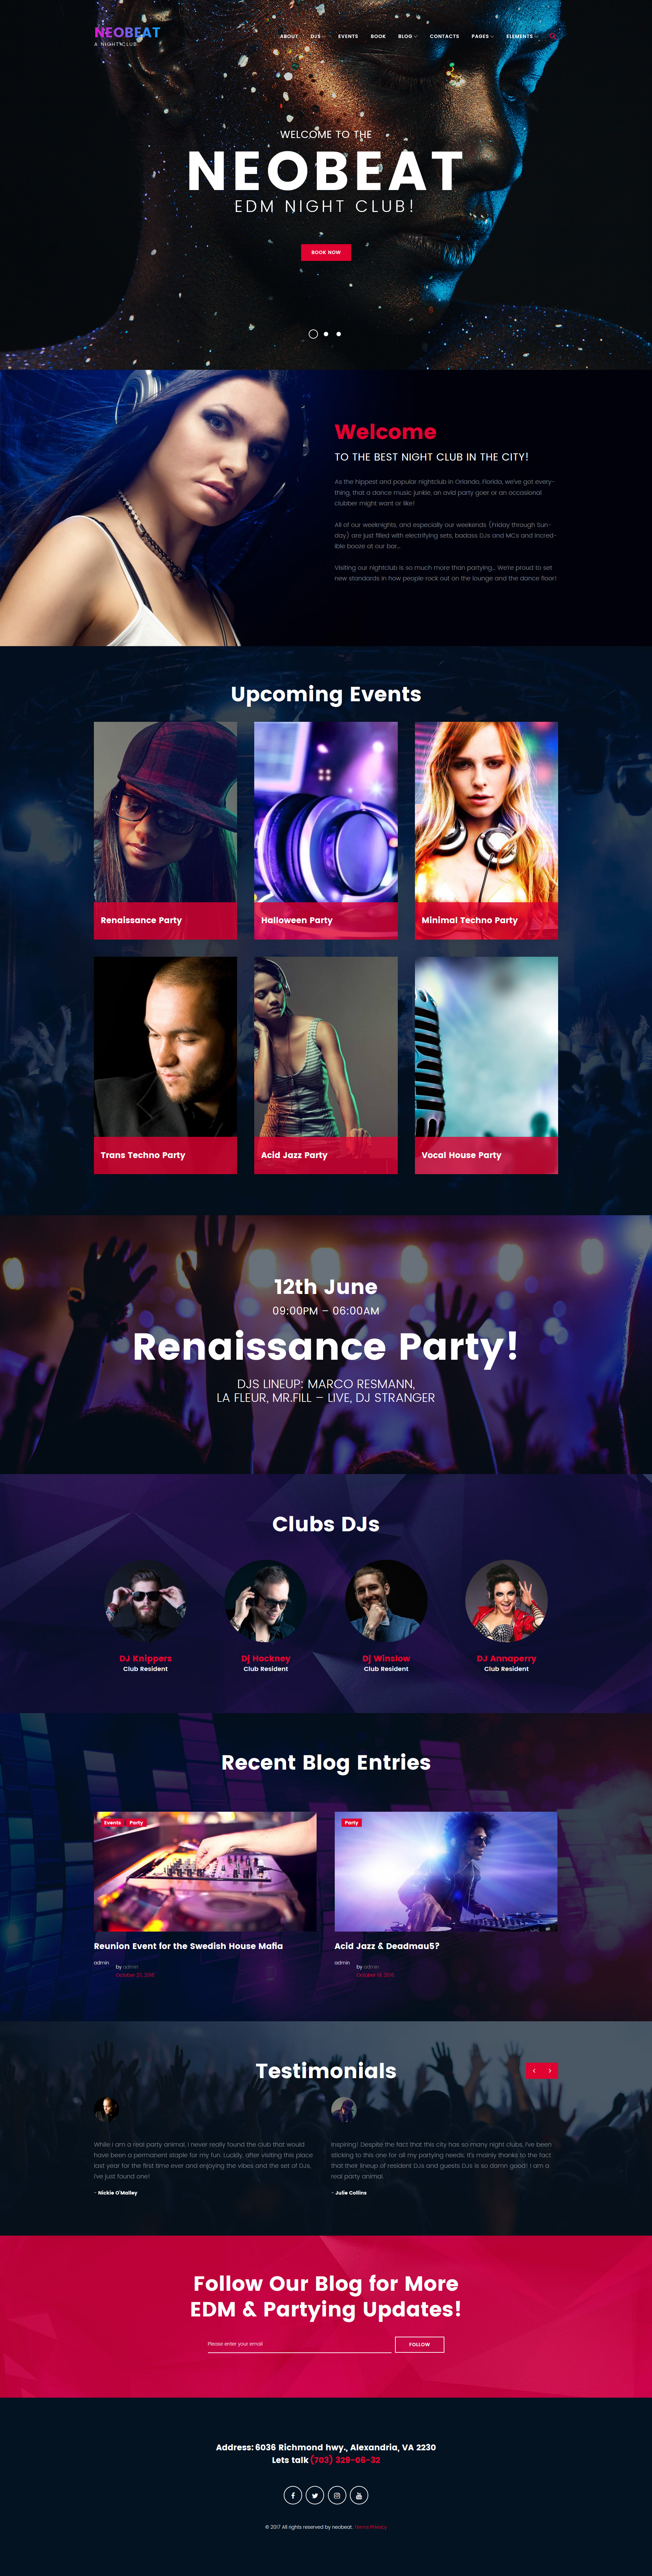 """Neobeat - Night Club & Entertainment"" 响应式WordPress模板 #63497"